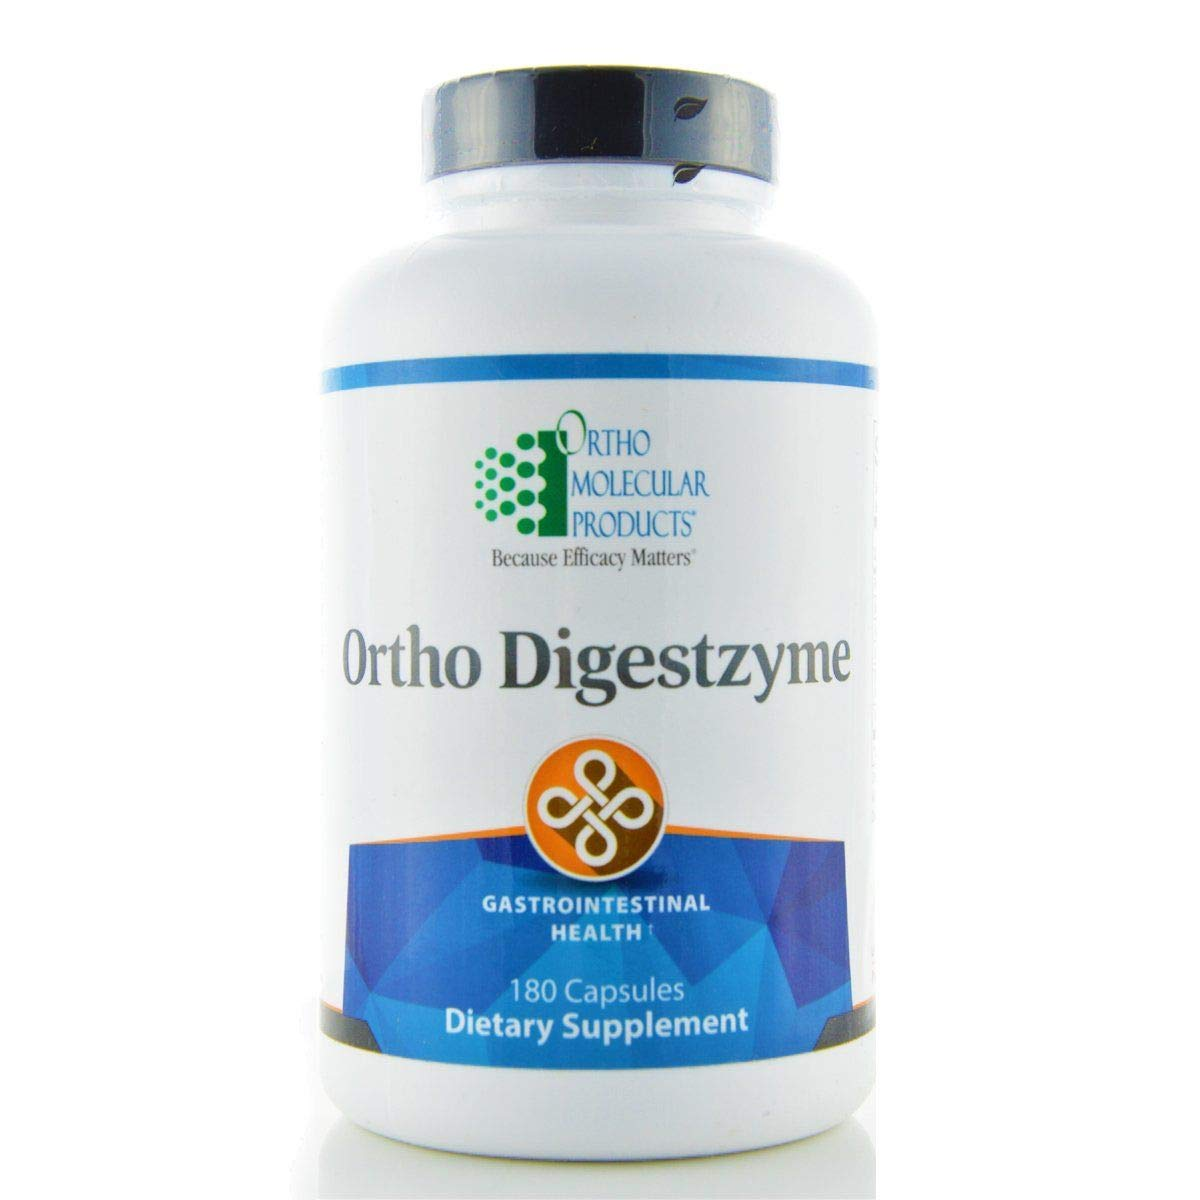 Ortho Molecular - Ortho Digestzyme - 180 Caps